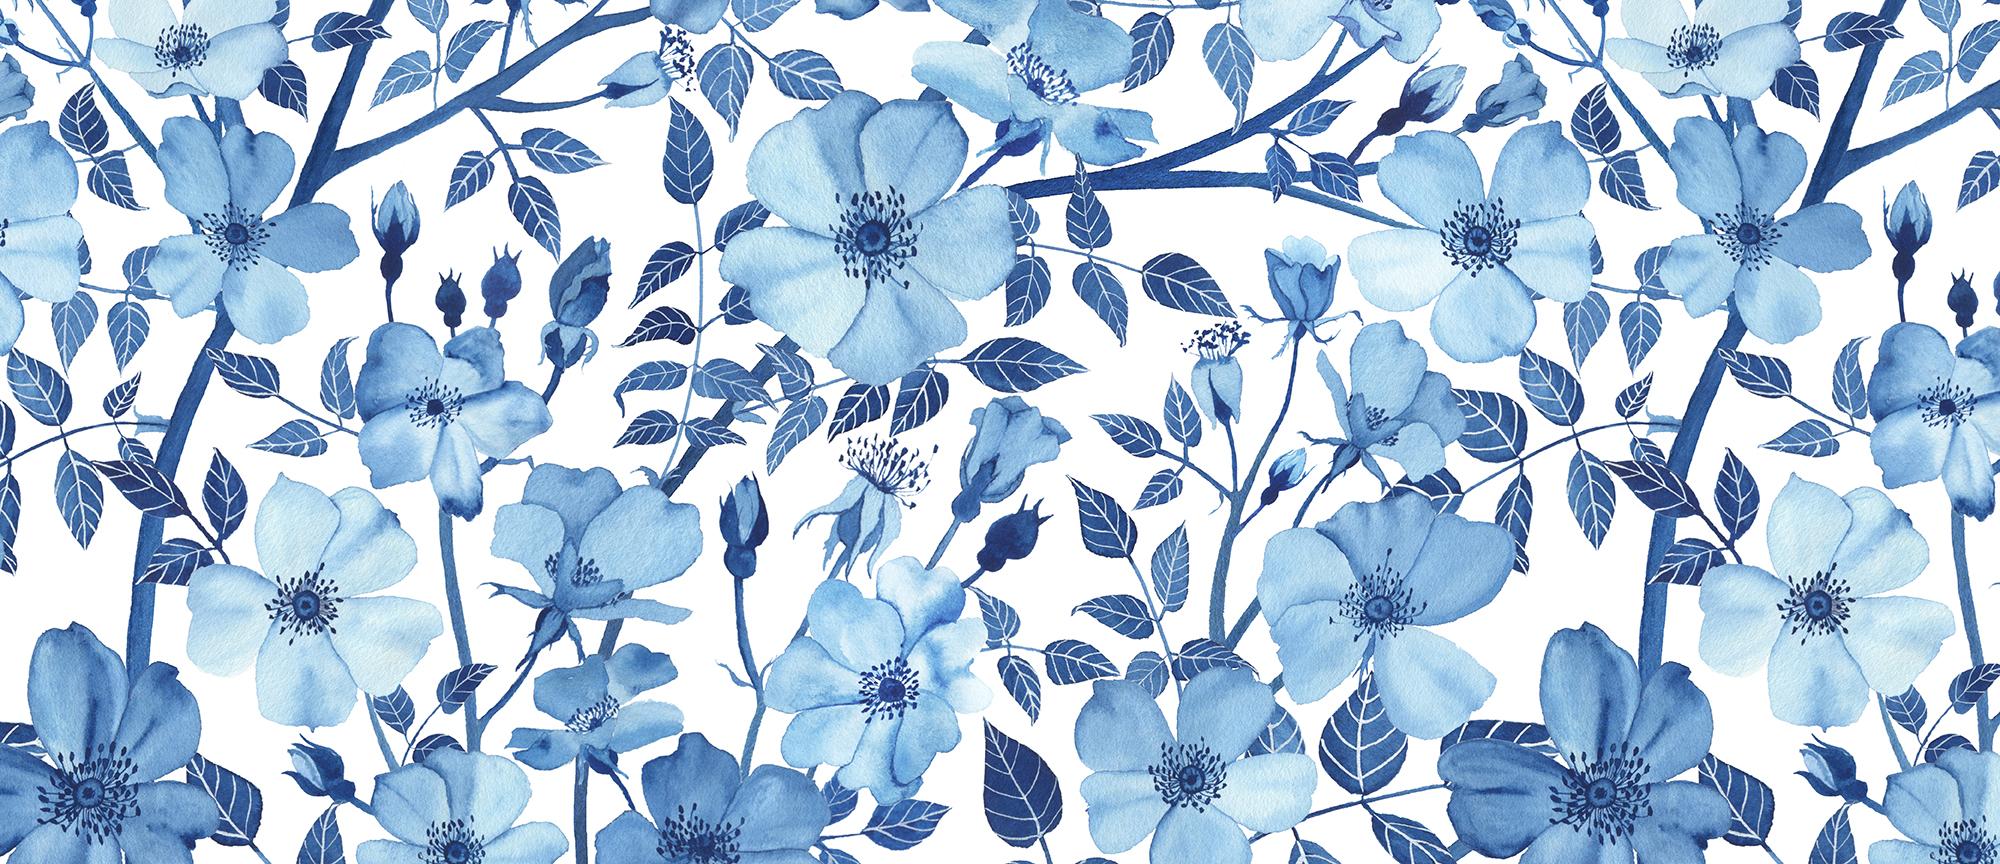 Watercolor Rose Garden in Blue